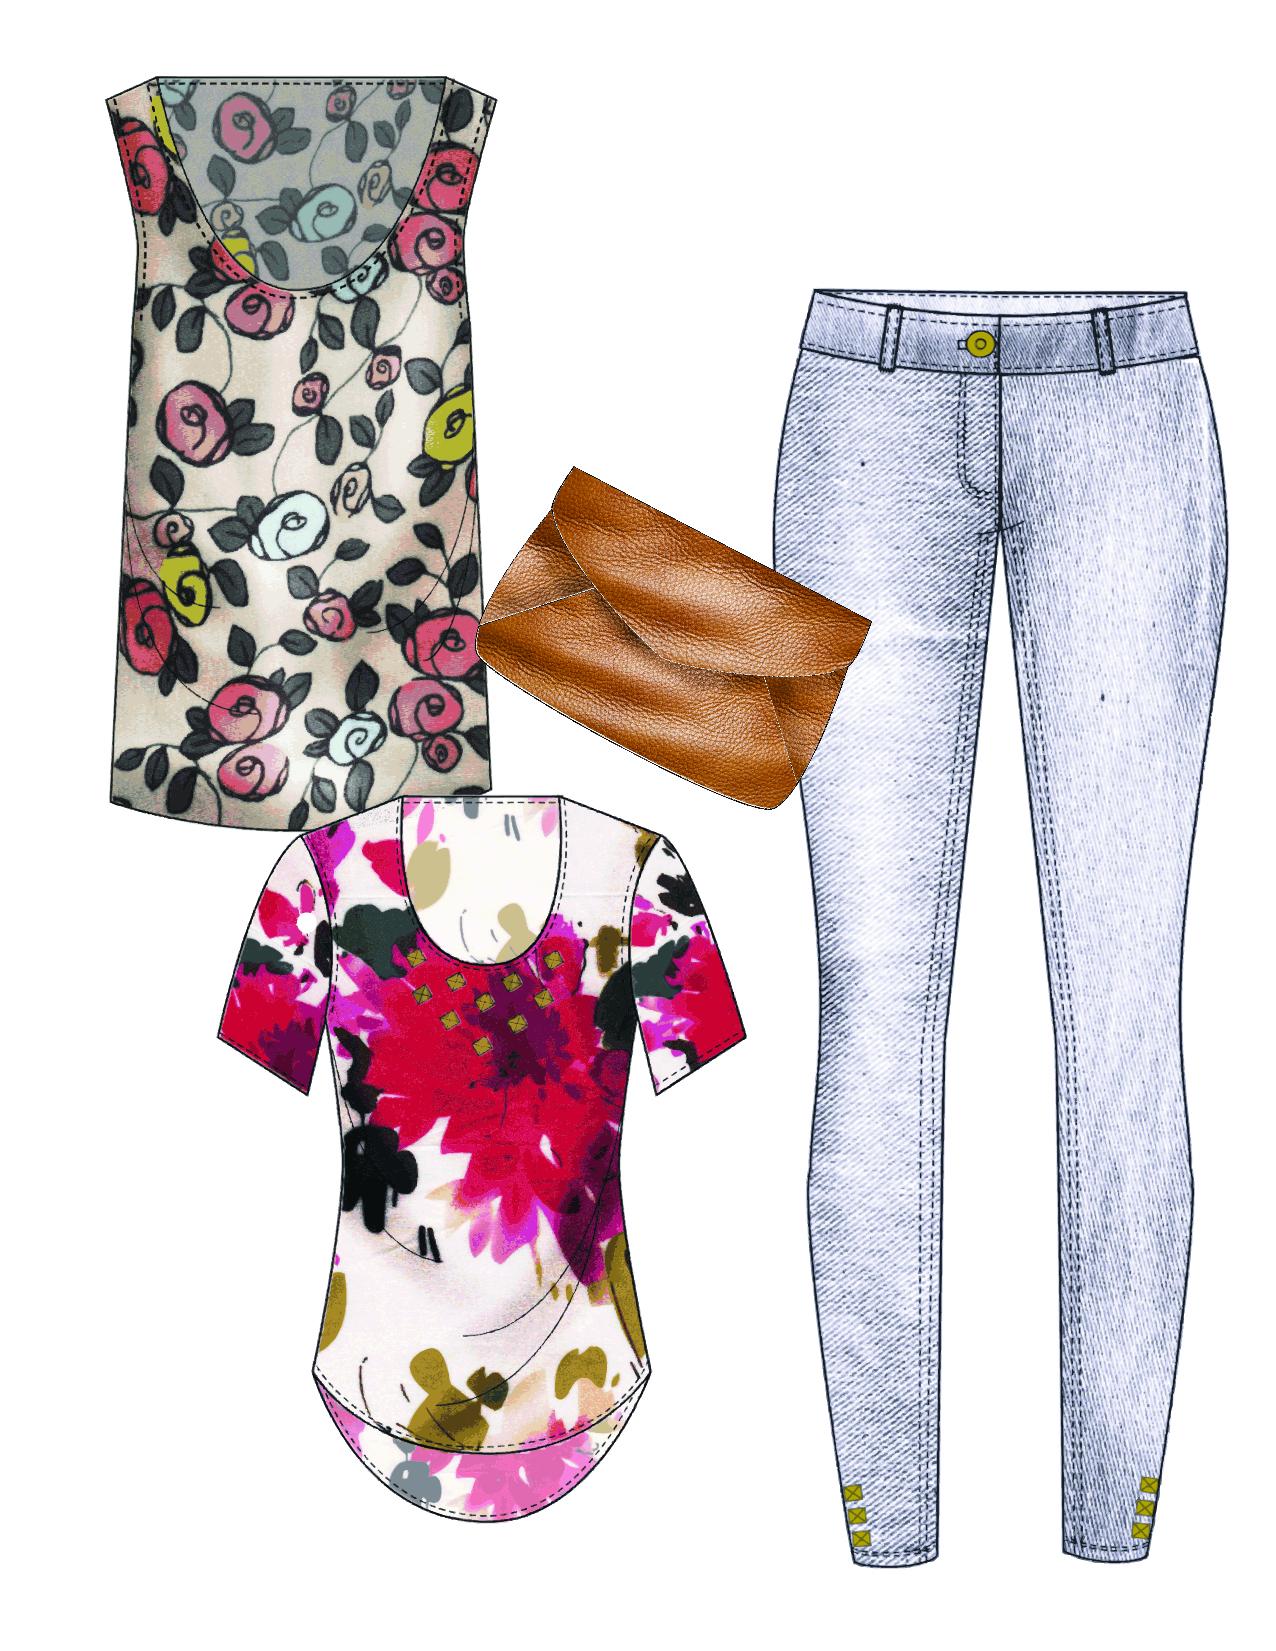 fashion-illustrations-29.jpg